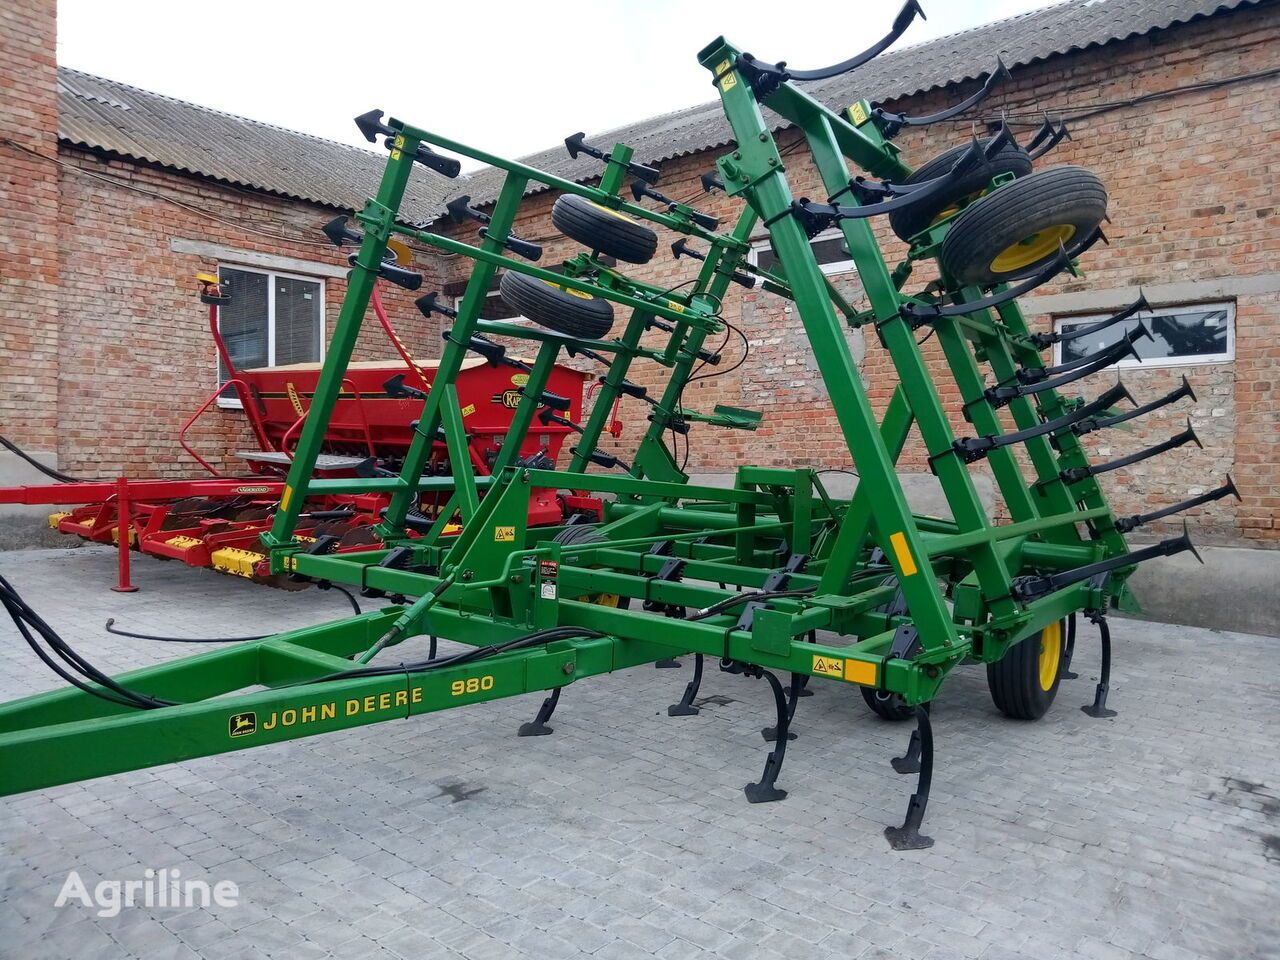 JOHN DEERE 980 cultivador